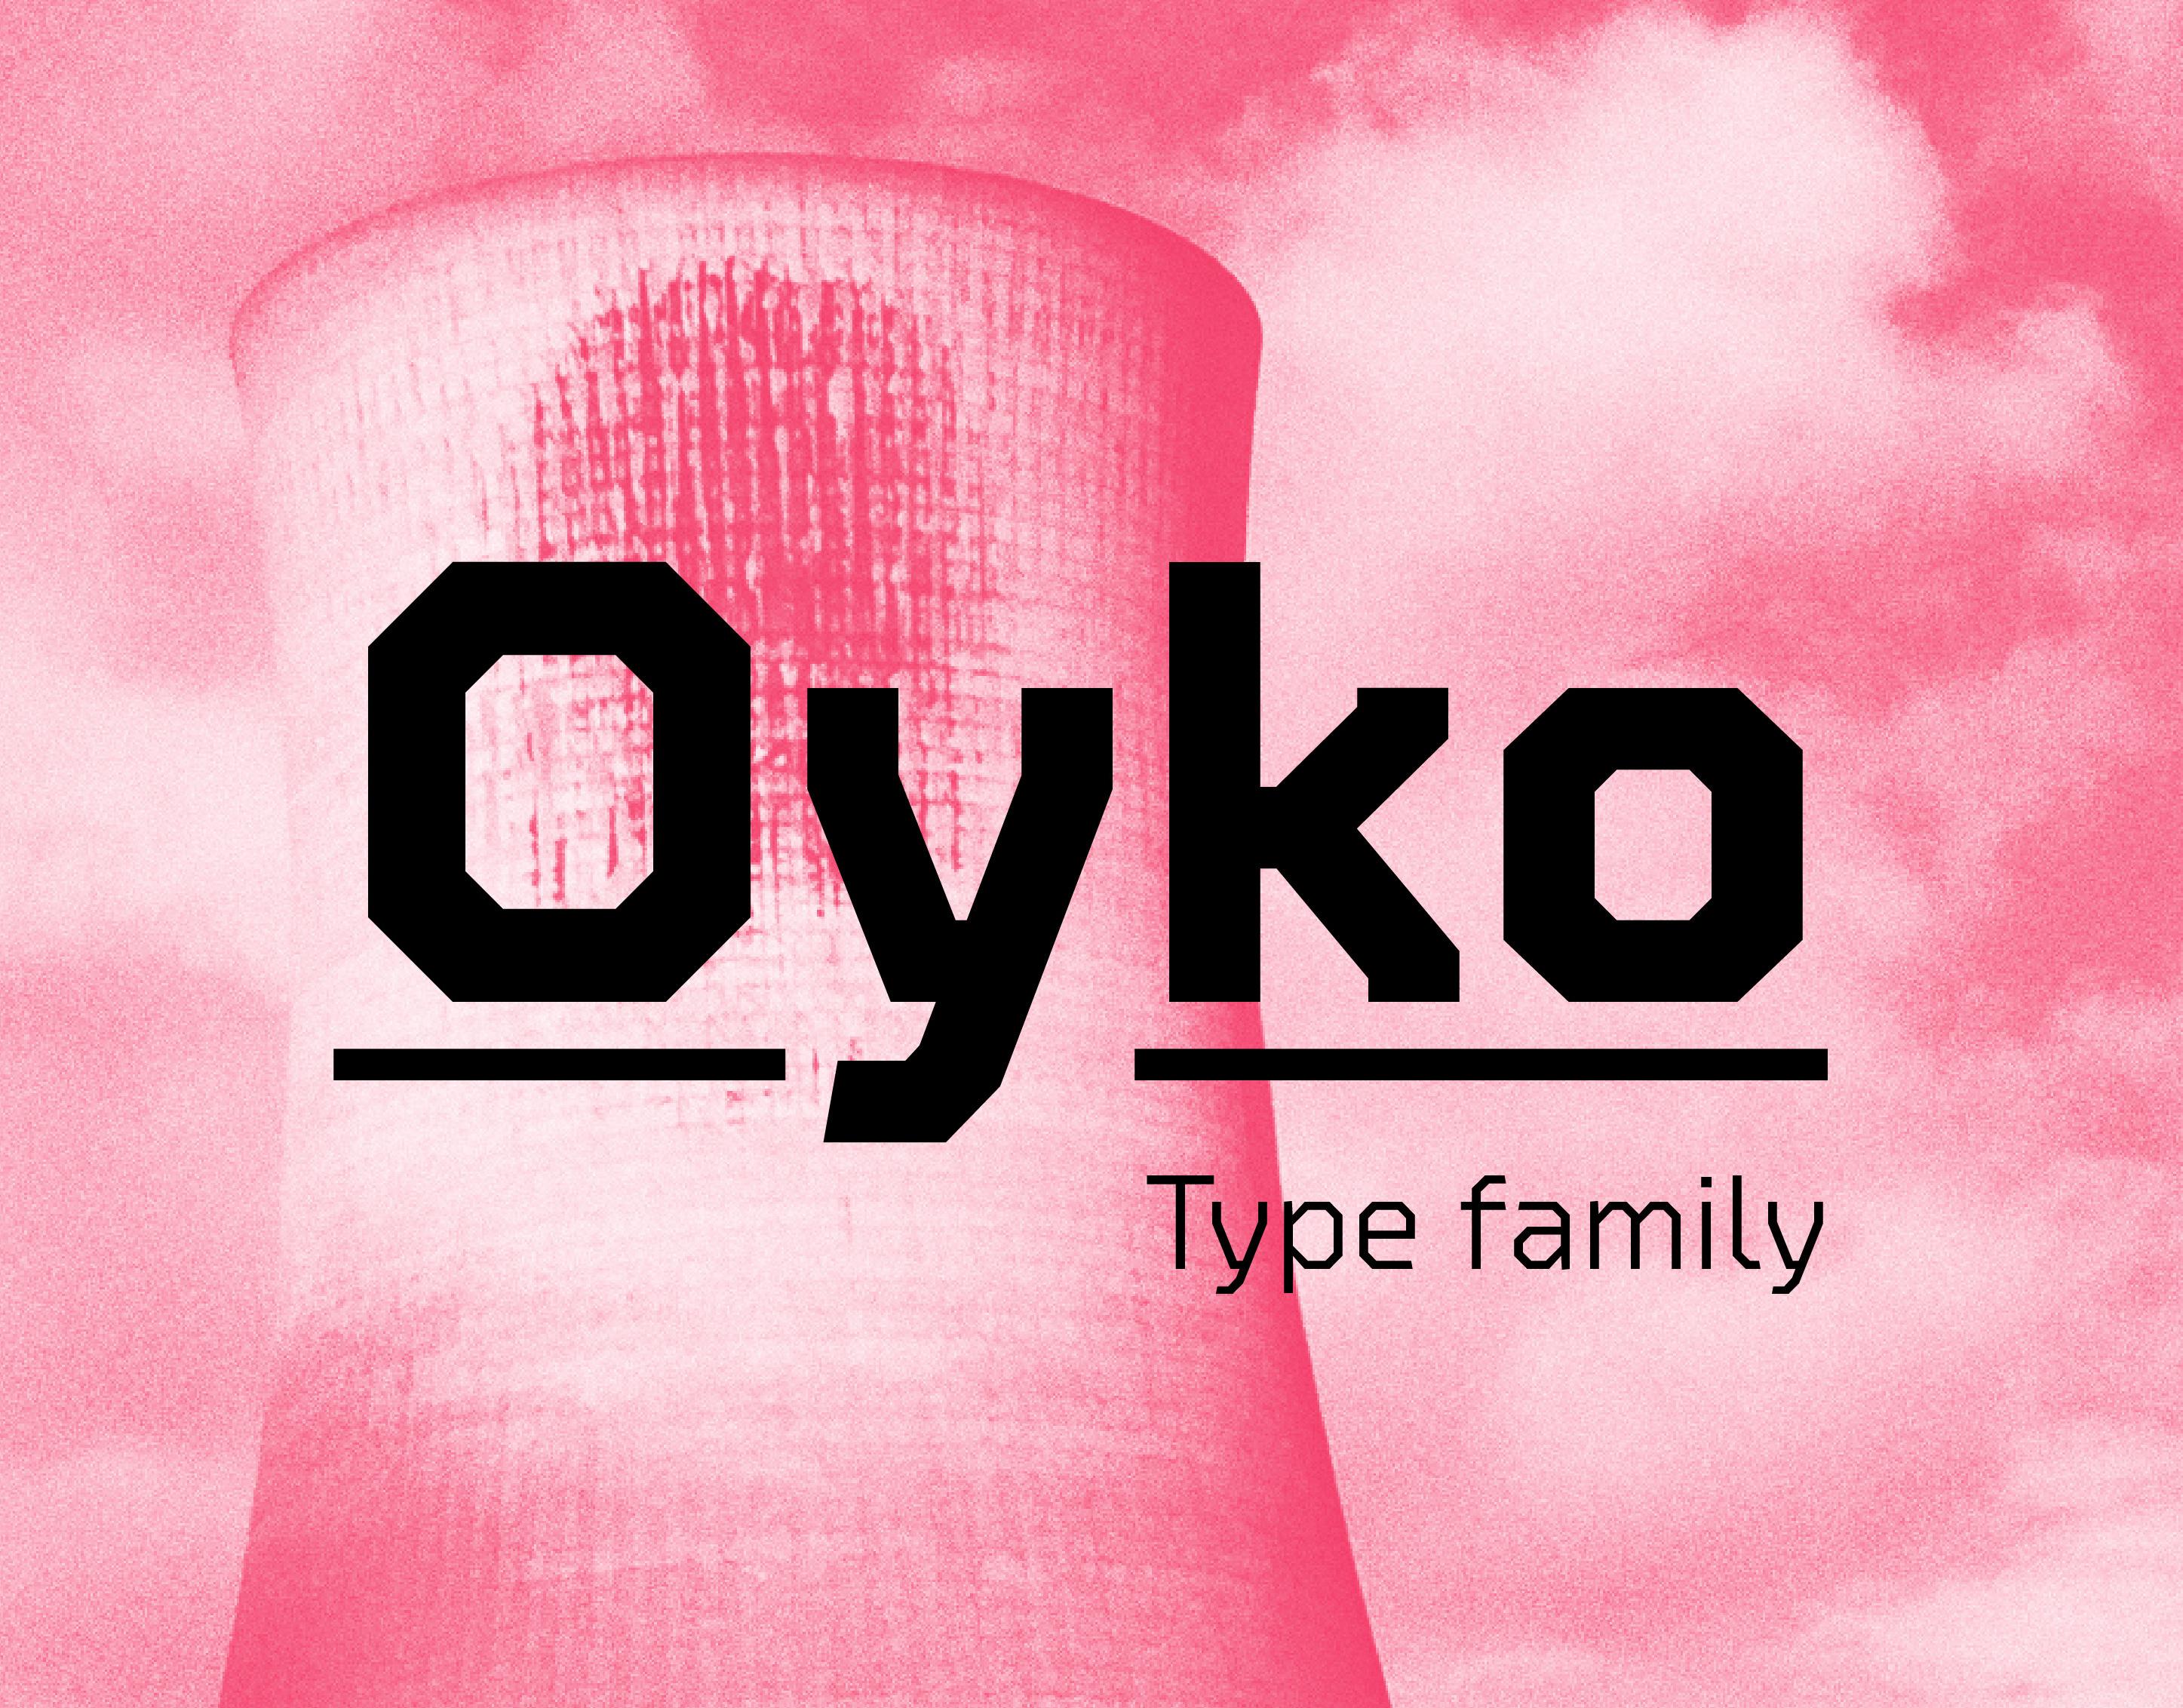 Jonathan Hill - Typeface Designer - Oyko - Type Family